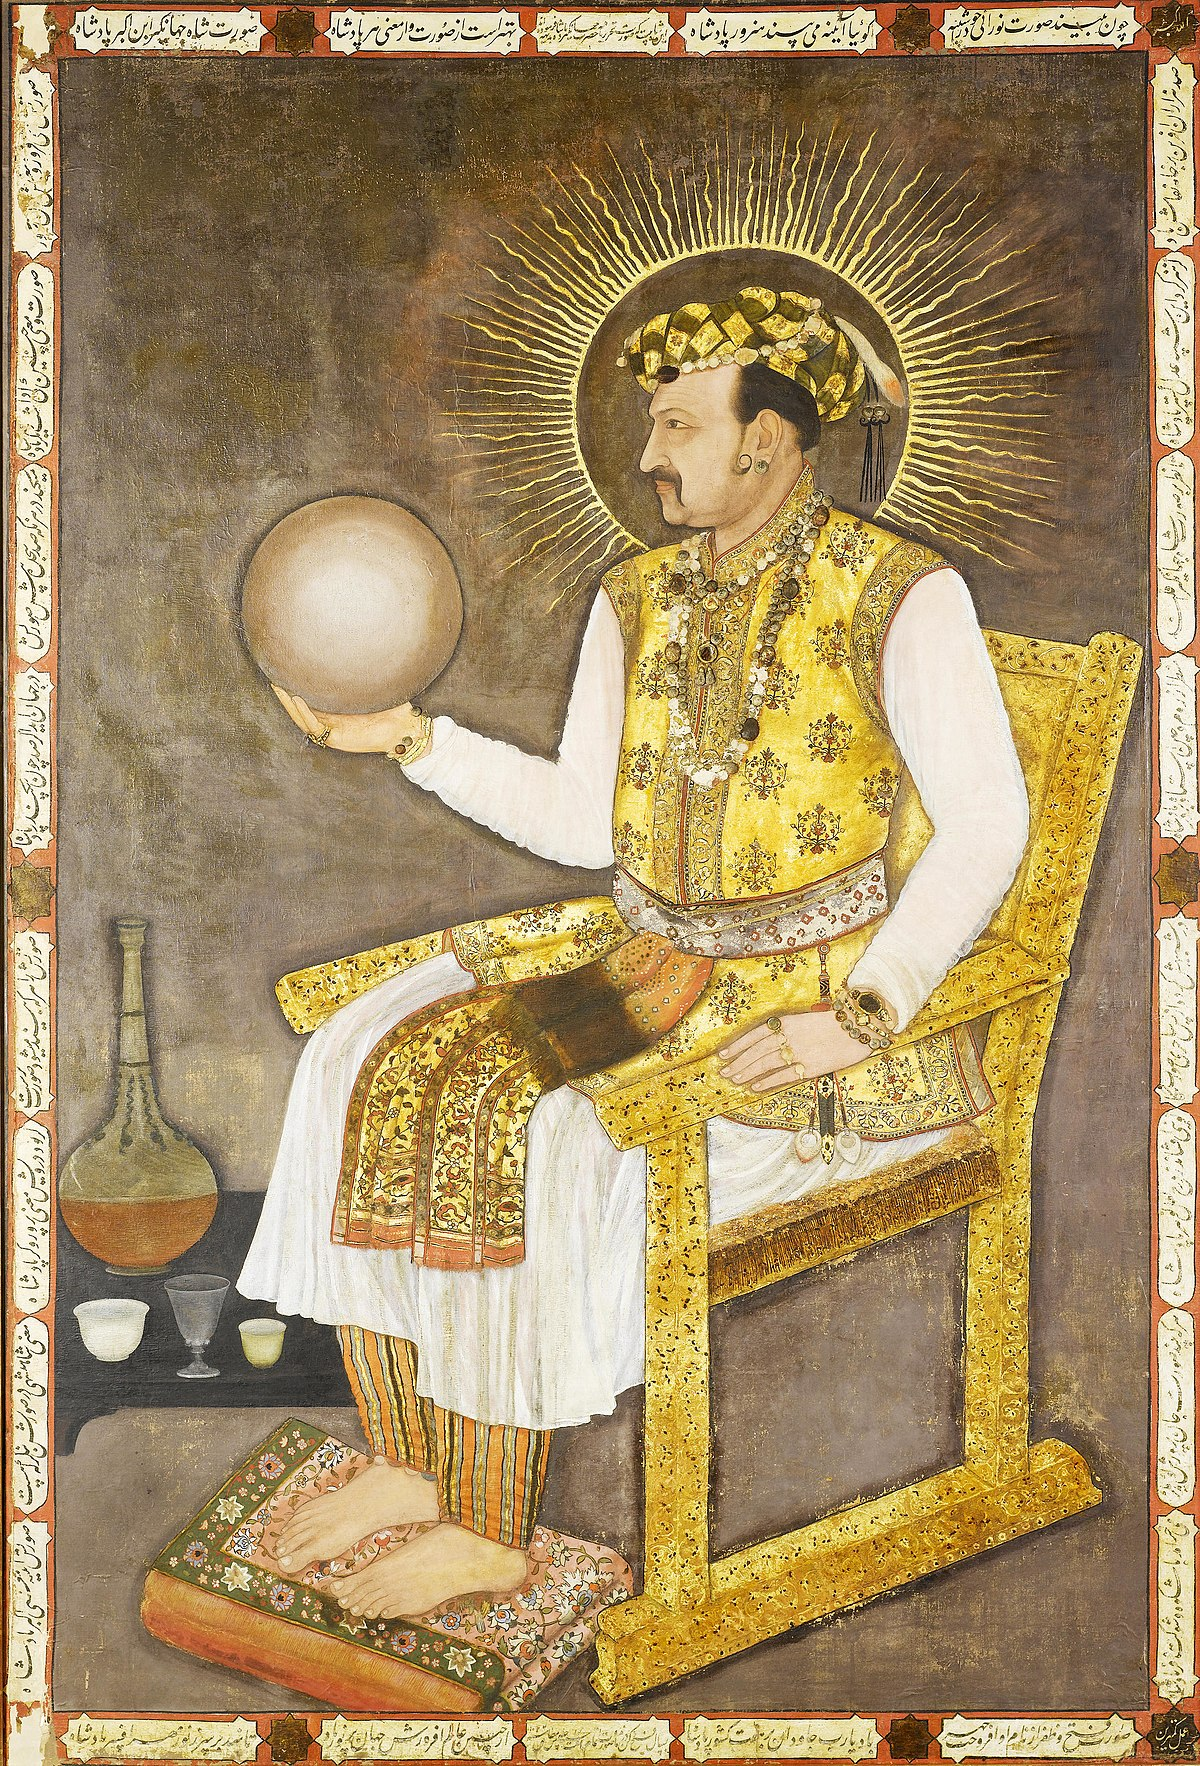 M/Jodhaa-Bollywood-Indian-Cinema-Blu-ray/dp/B003VL2SQ4/ Pictures of king akbar